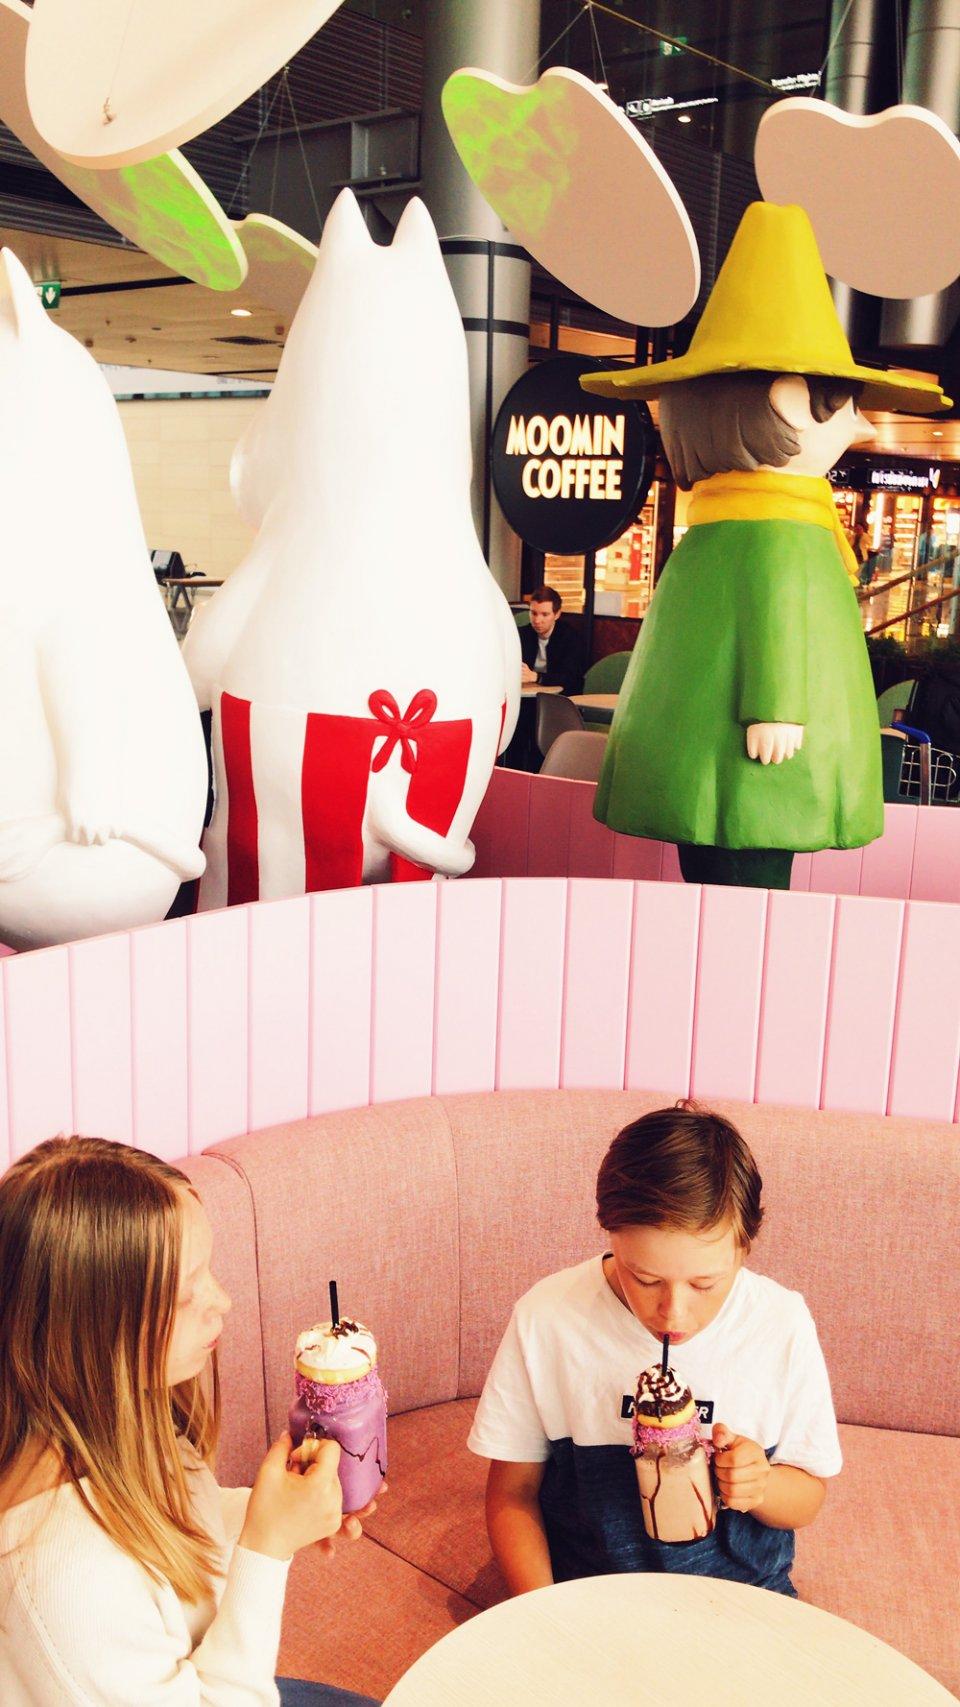 Moomin_Coffee_Helsinki_Airport_Cafe_Portions-960x1707